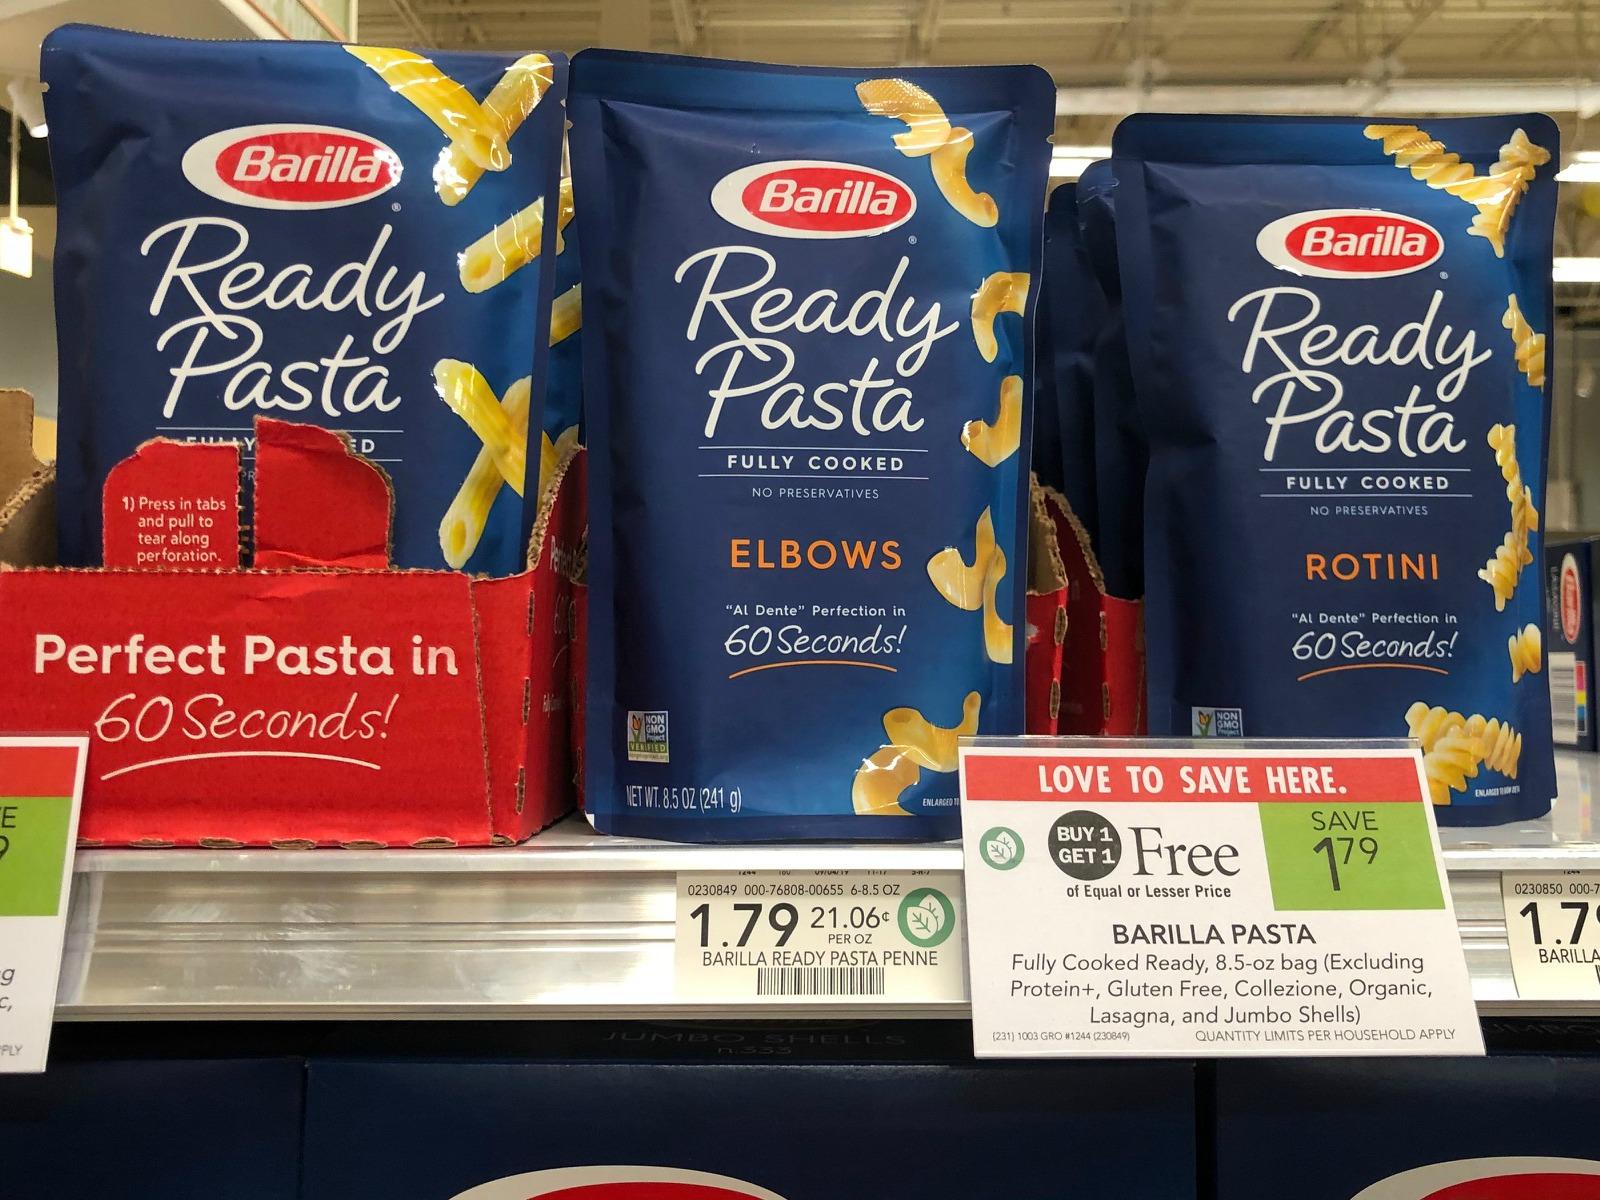 FREE Barilla Ready Pasta At Publix (& Cheap Blue Box Pasta) on I Heart Publix